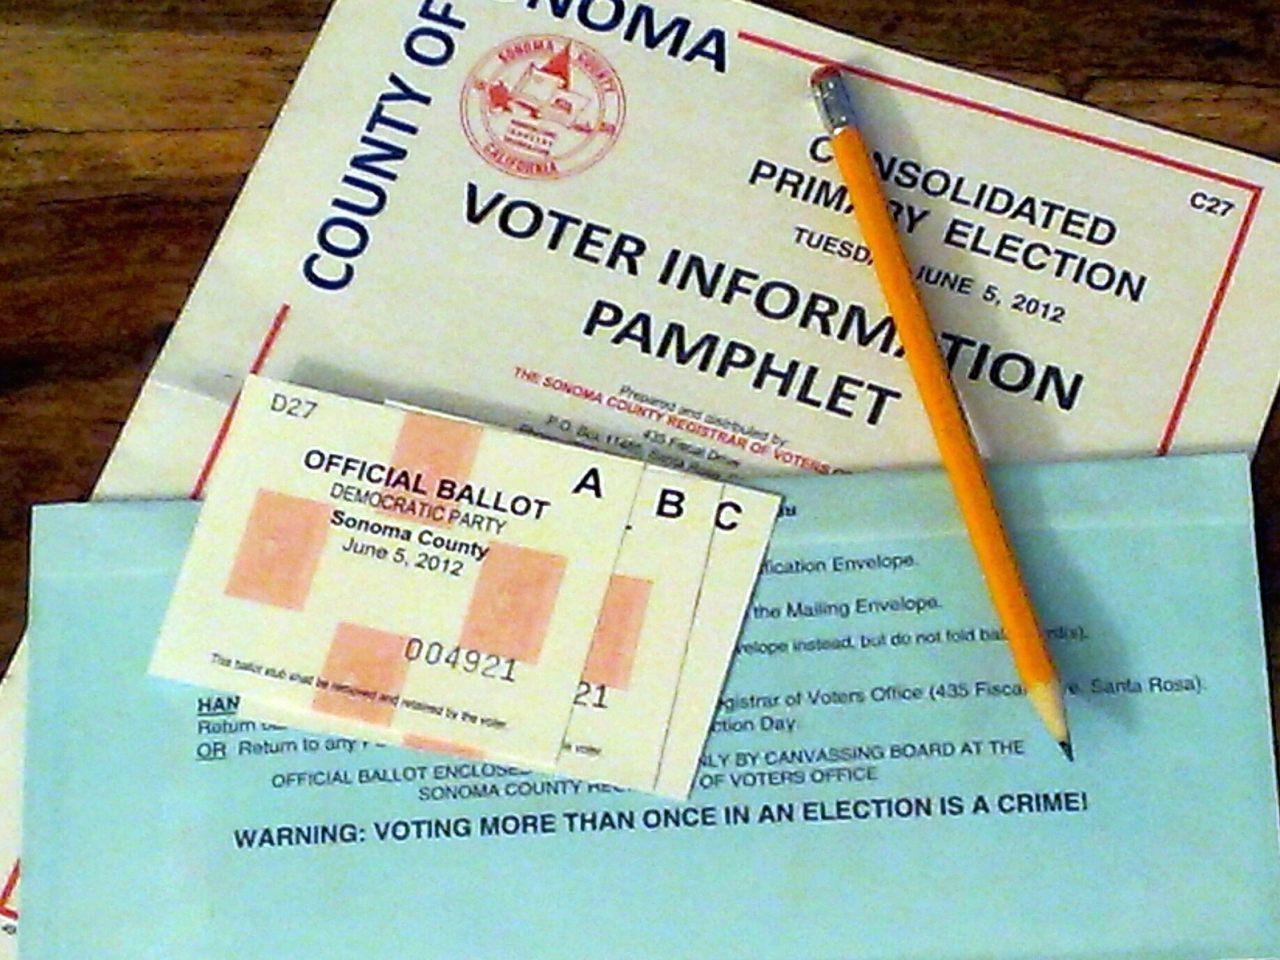 U0026 39 Vote By Mail U0026 39  Ballots Sent In California Primary